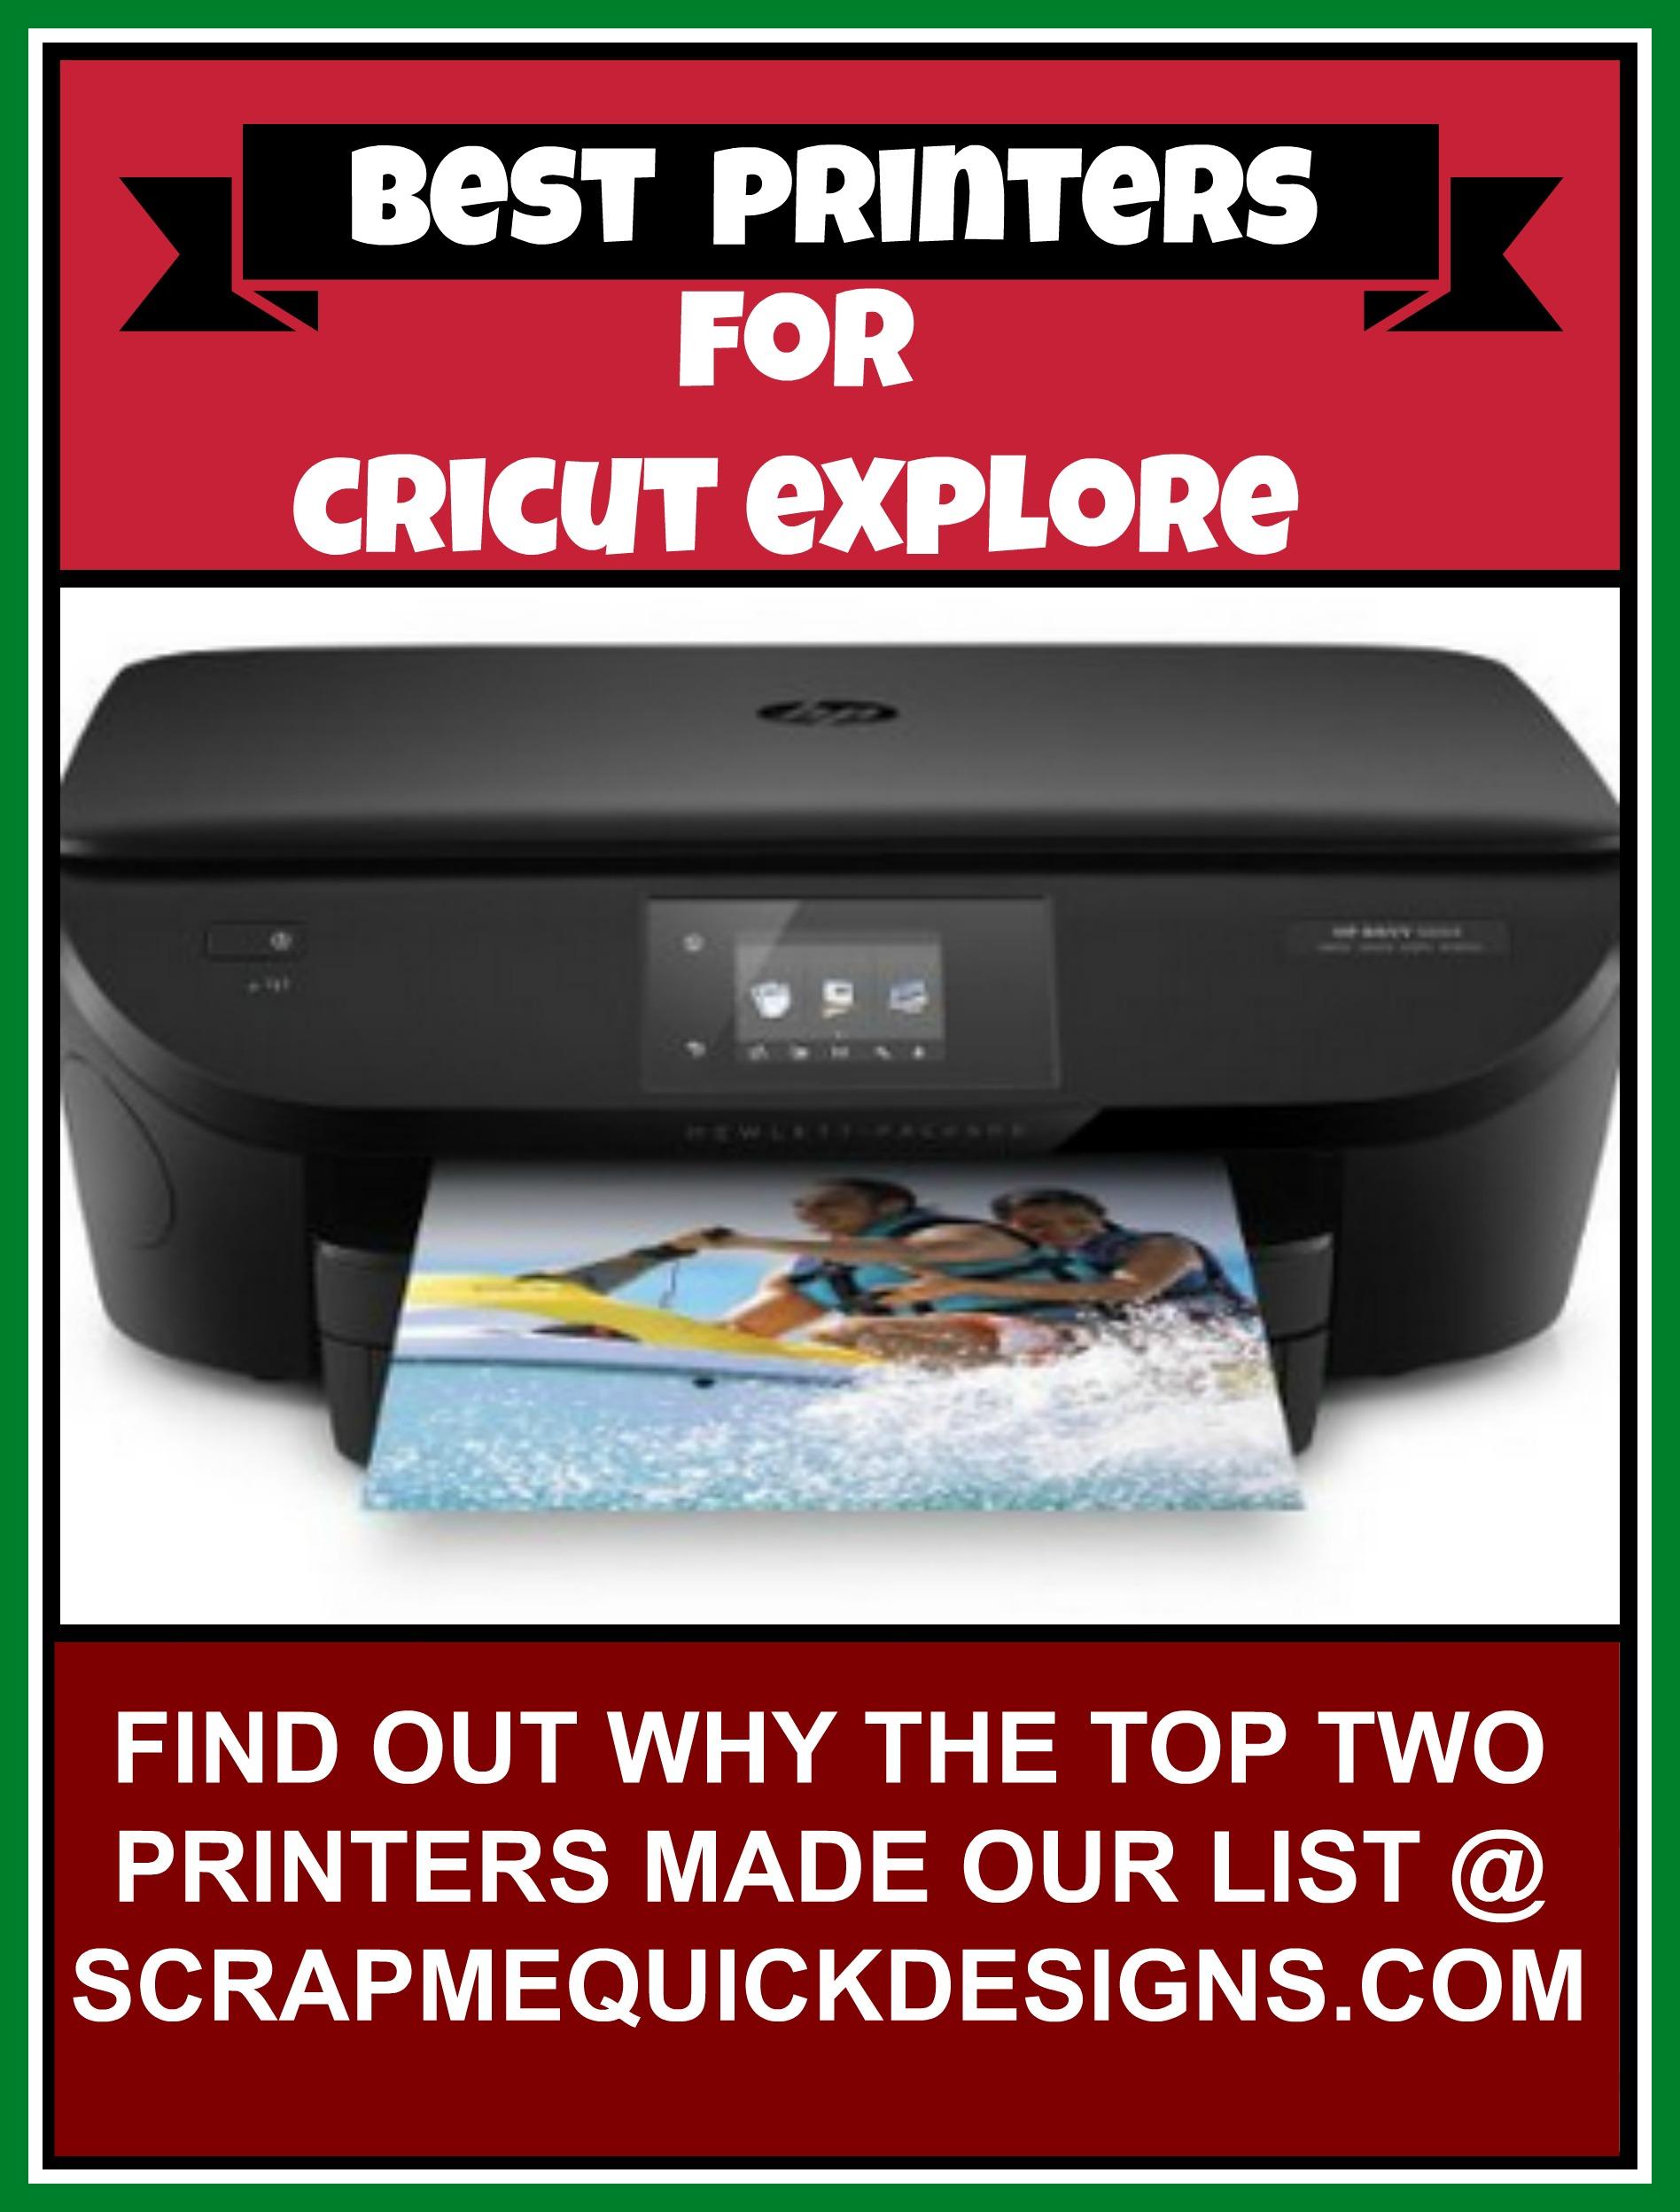 Top Two Printers for Cricut Explore - Scrap Me Quick Designs